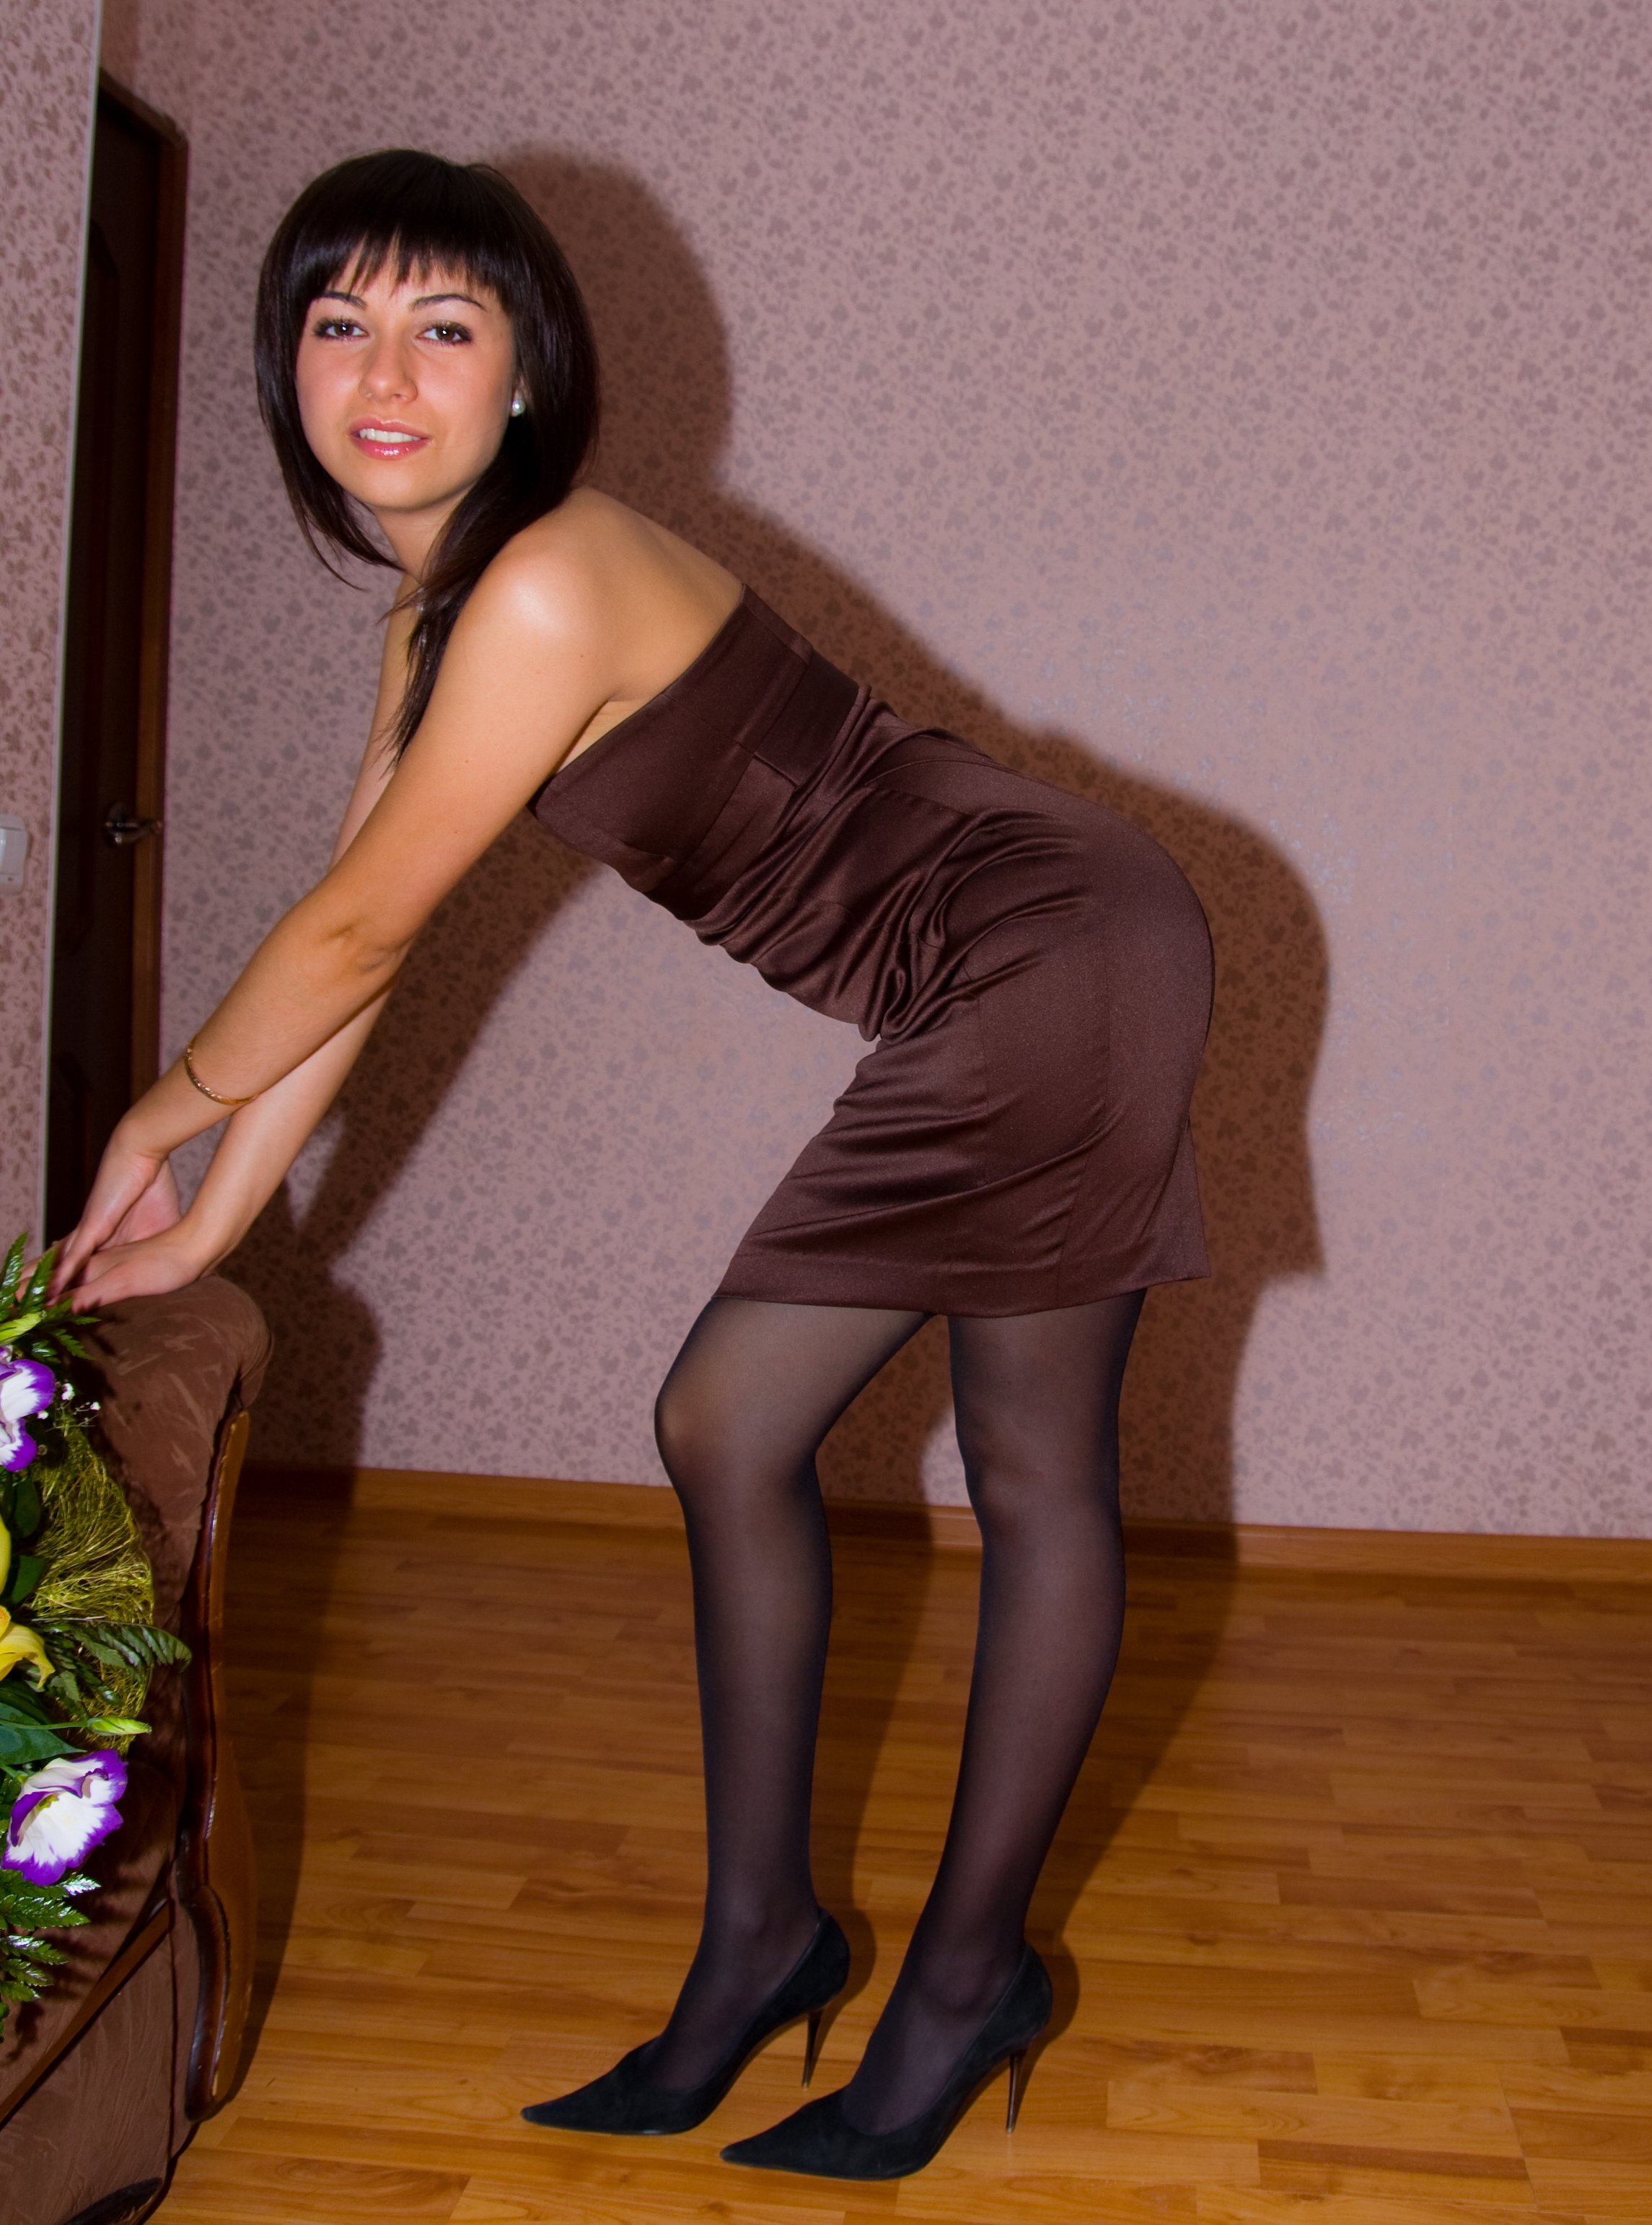 Pantyhose Ebony Teen Pantyhose Teen 85